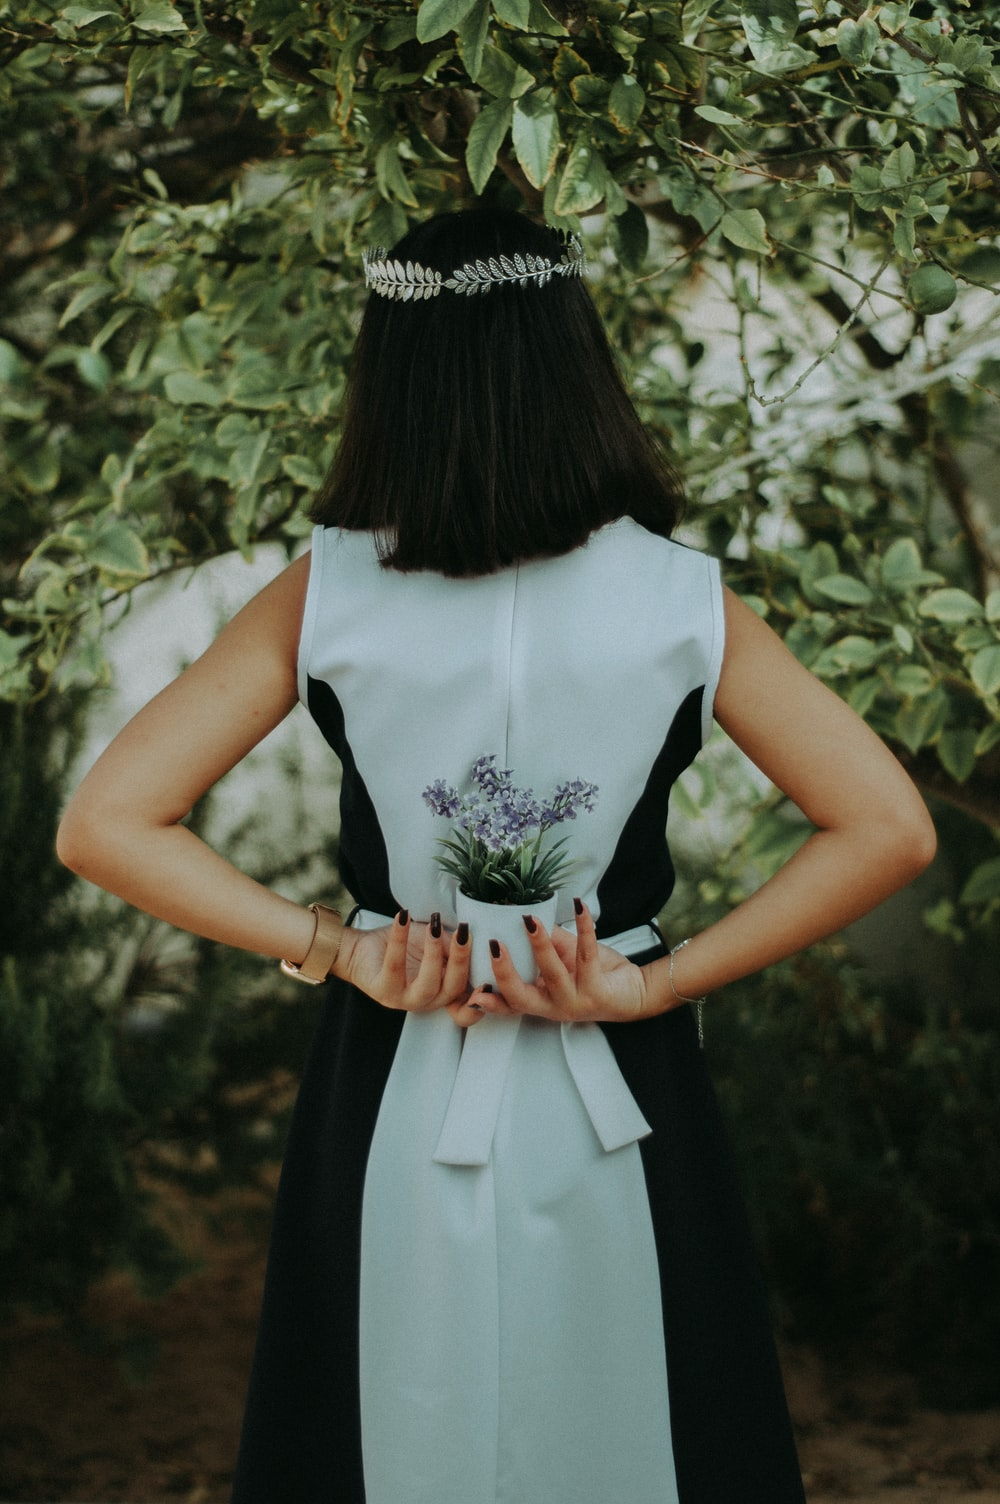 women's black and white sleeveless dress